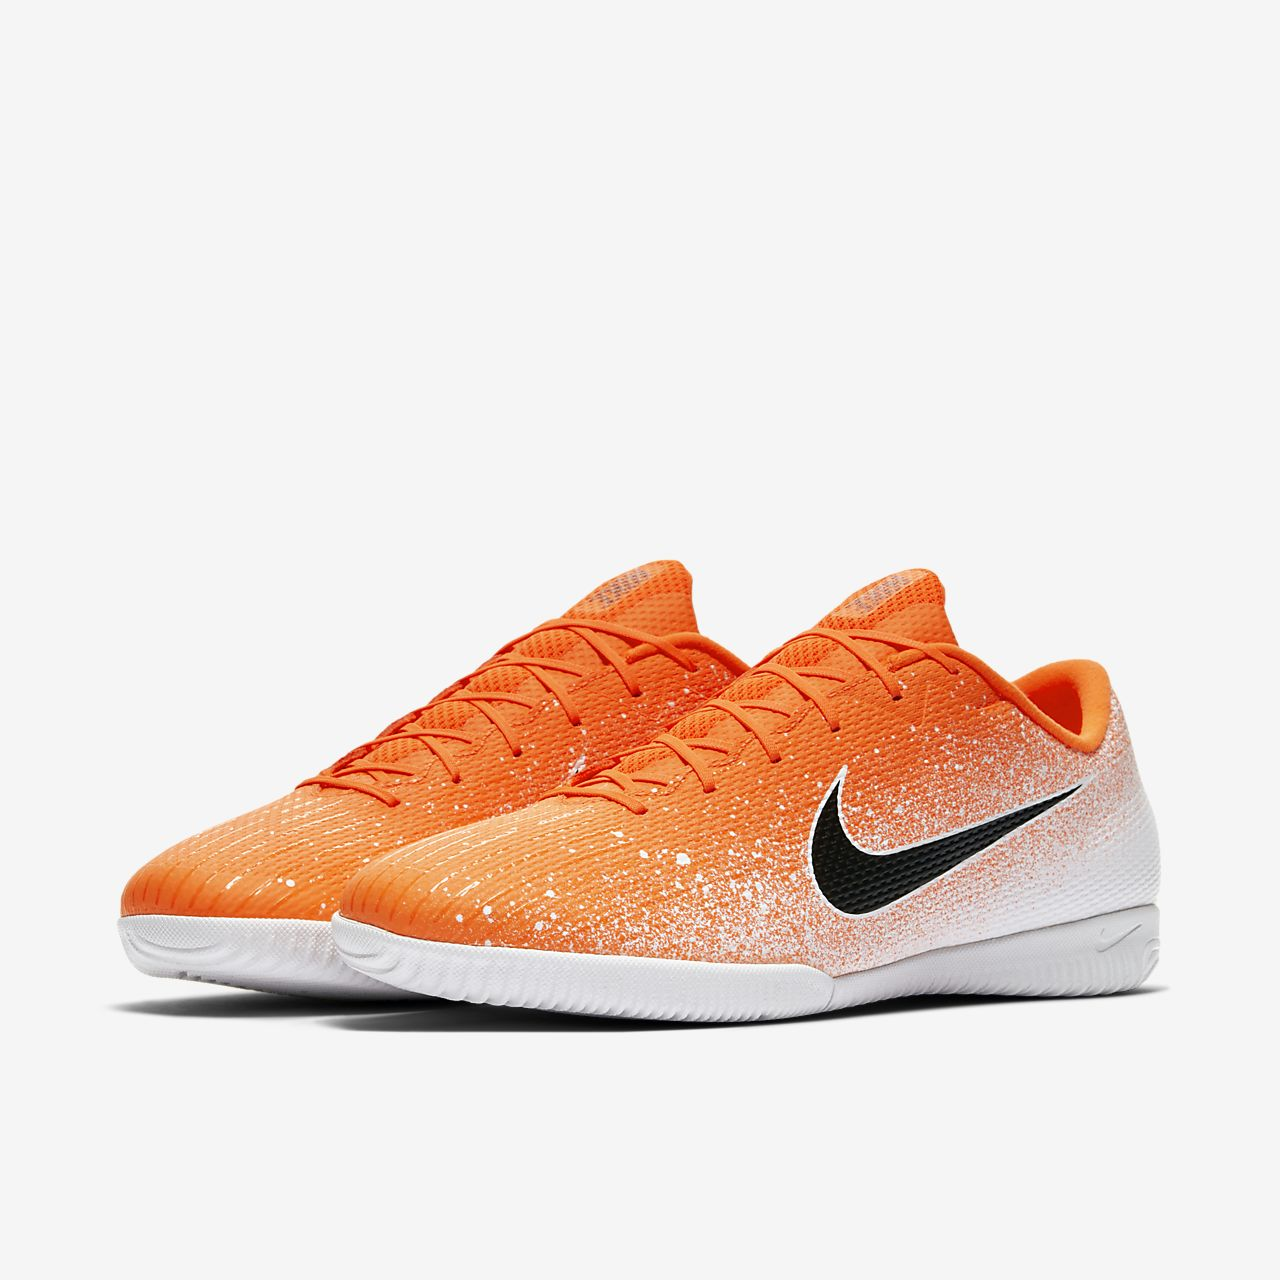 official photos 9b9af cee04 Nike VaporX 12 Academy IC Indoor/Court Football Shoe